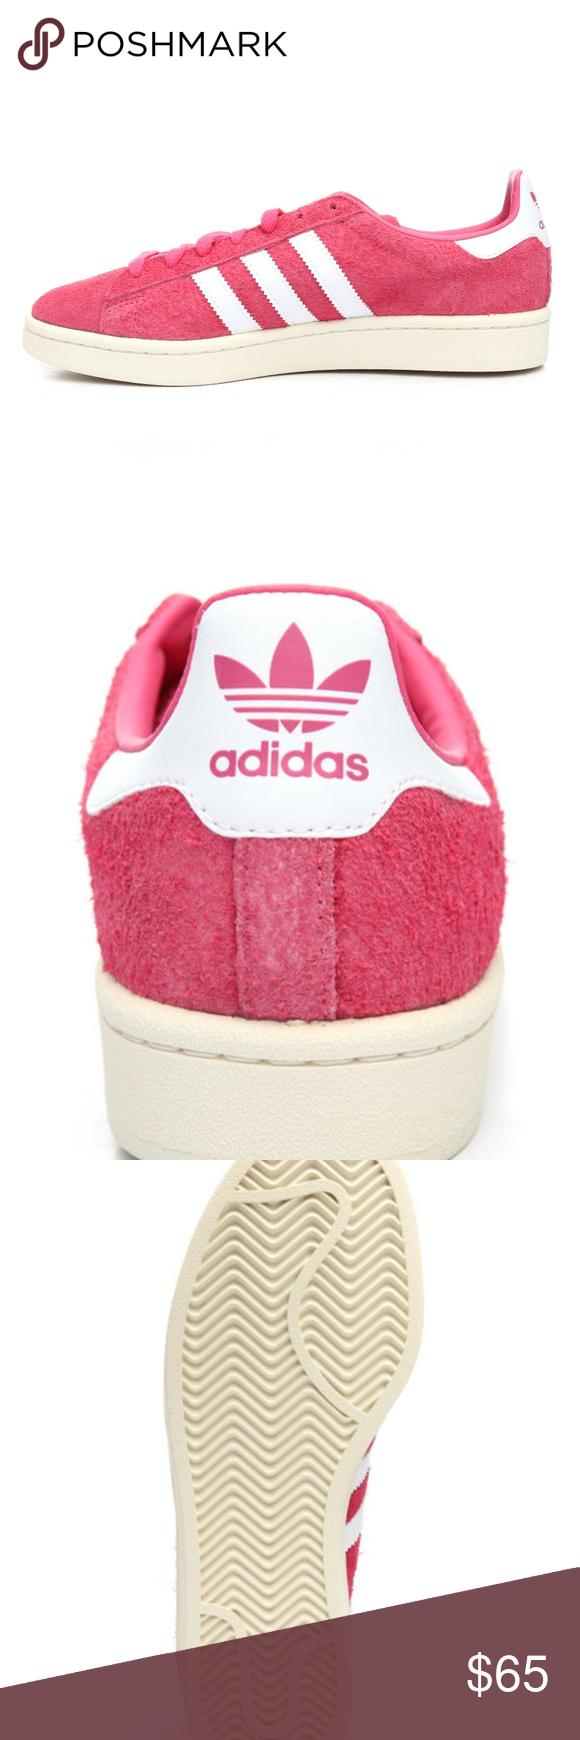 Nuove adidas campus lo scarpe rosa nwt pinterest adidas campus